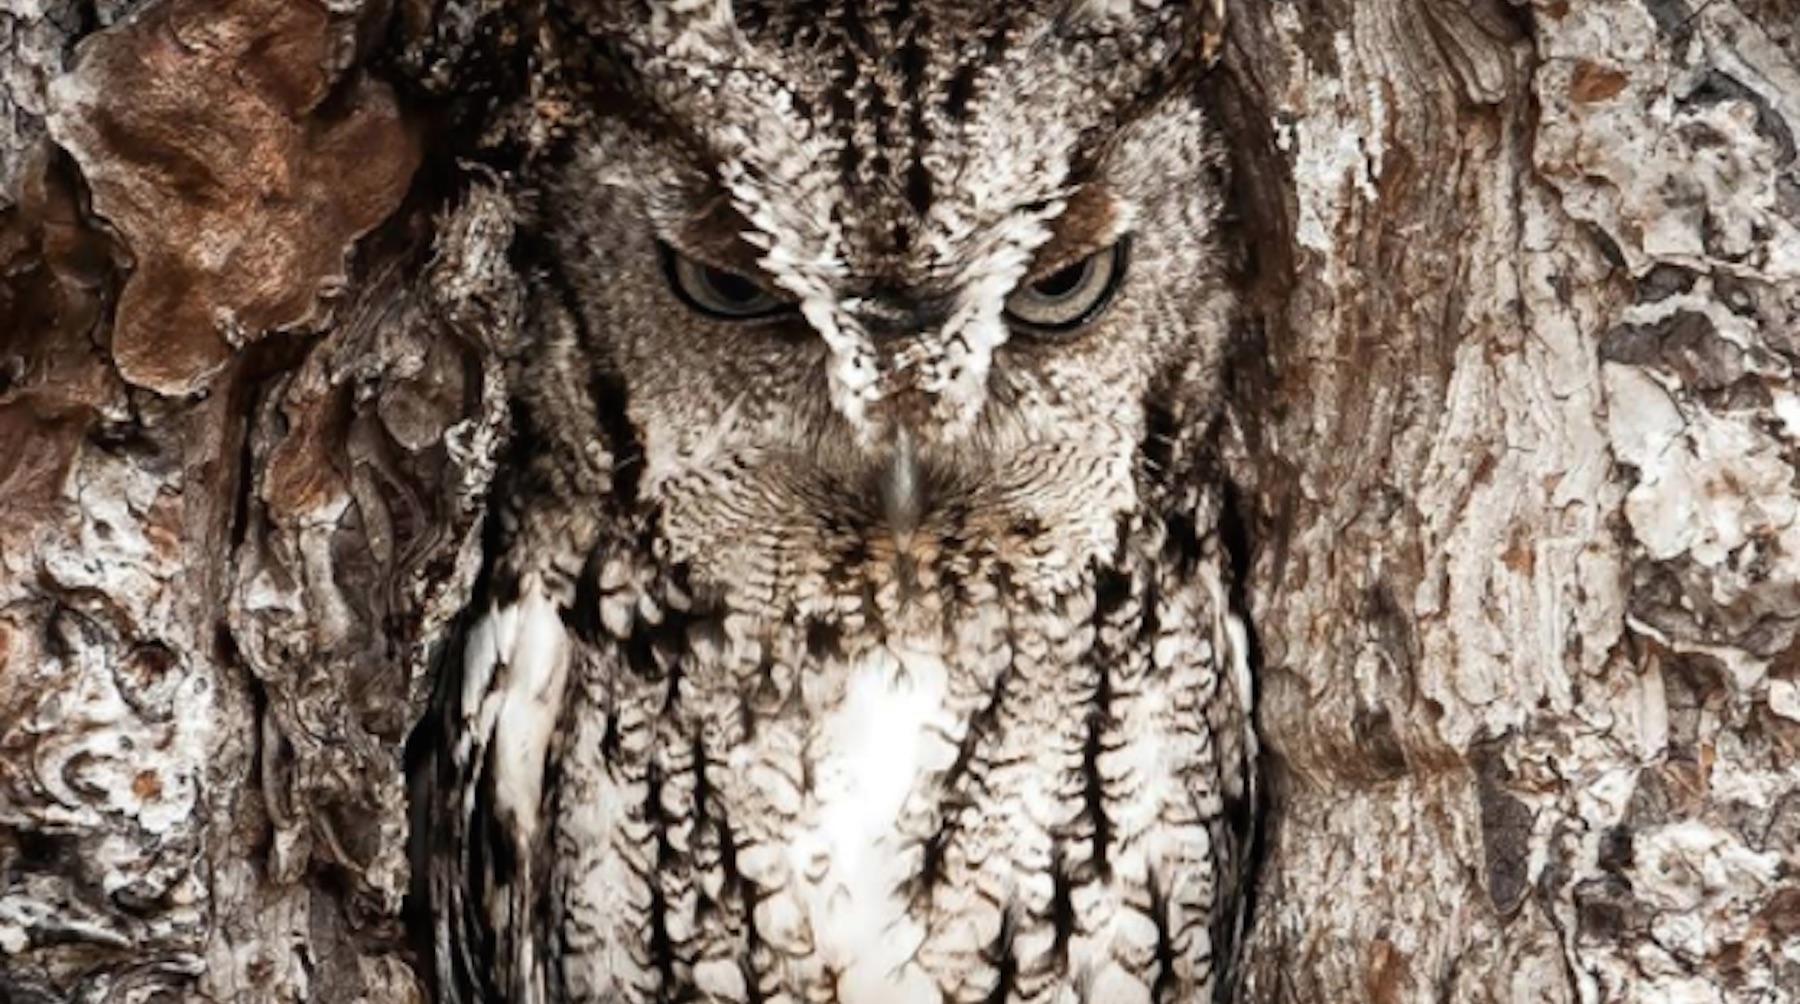 owl-1506296153436-1506296158888.jpg